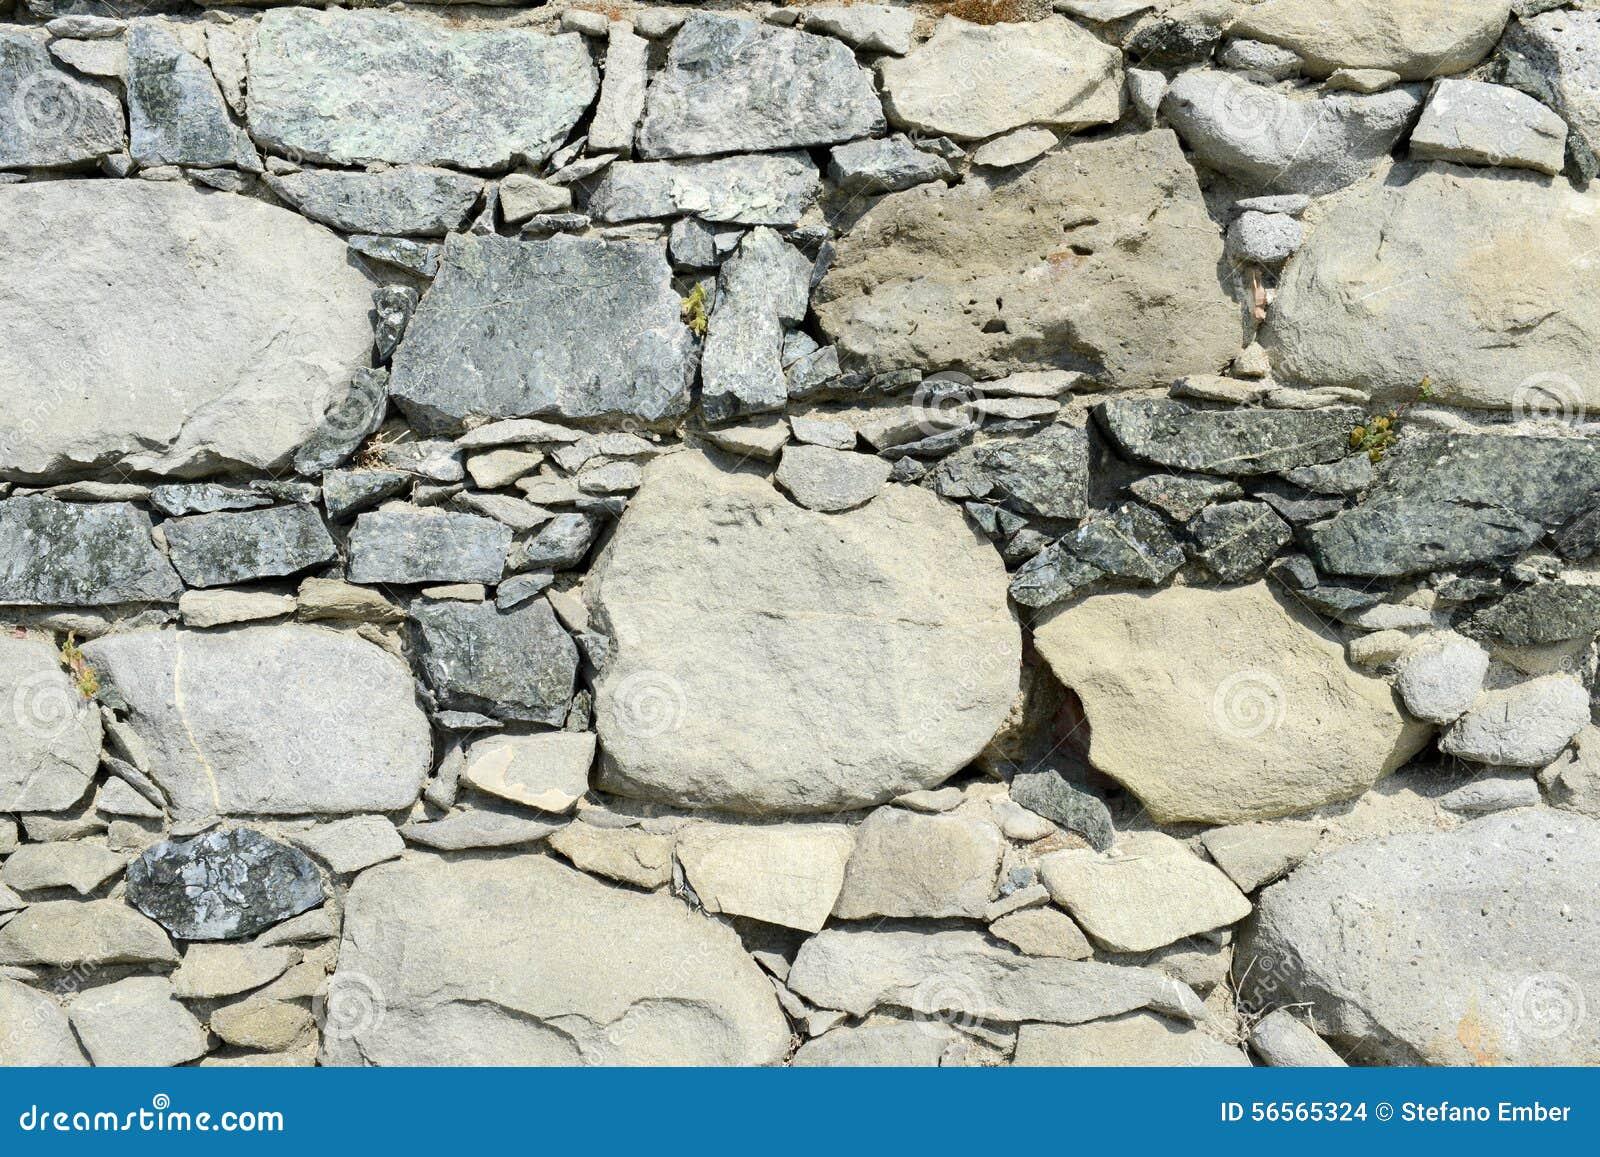 Download Ανασκόπηση του τοίχου πετρών Στοκ Εικόνες - εικόνα από ζωηρόχρωμος, antiquate: 56565324